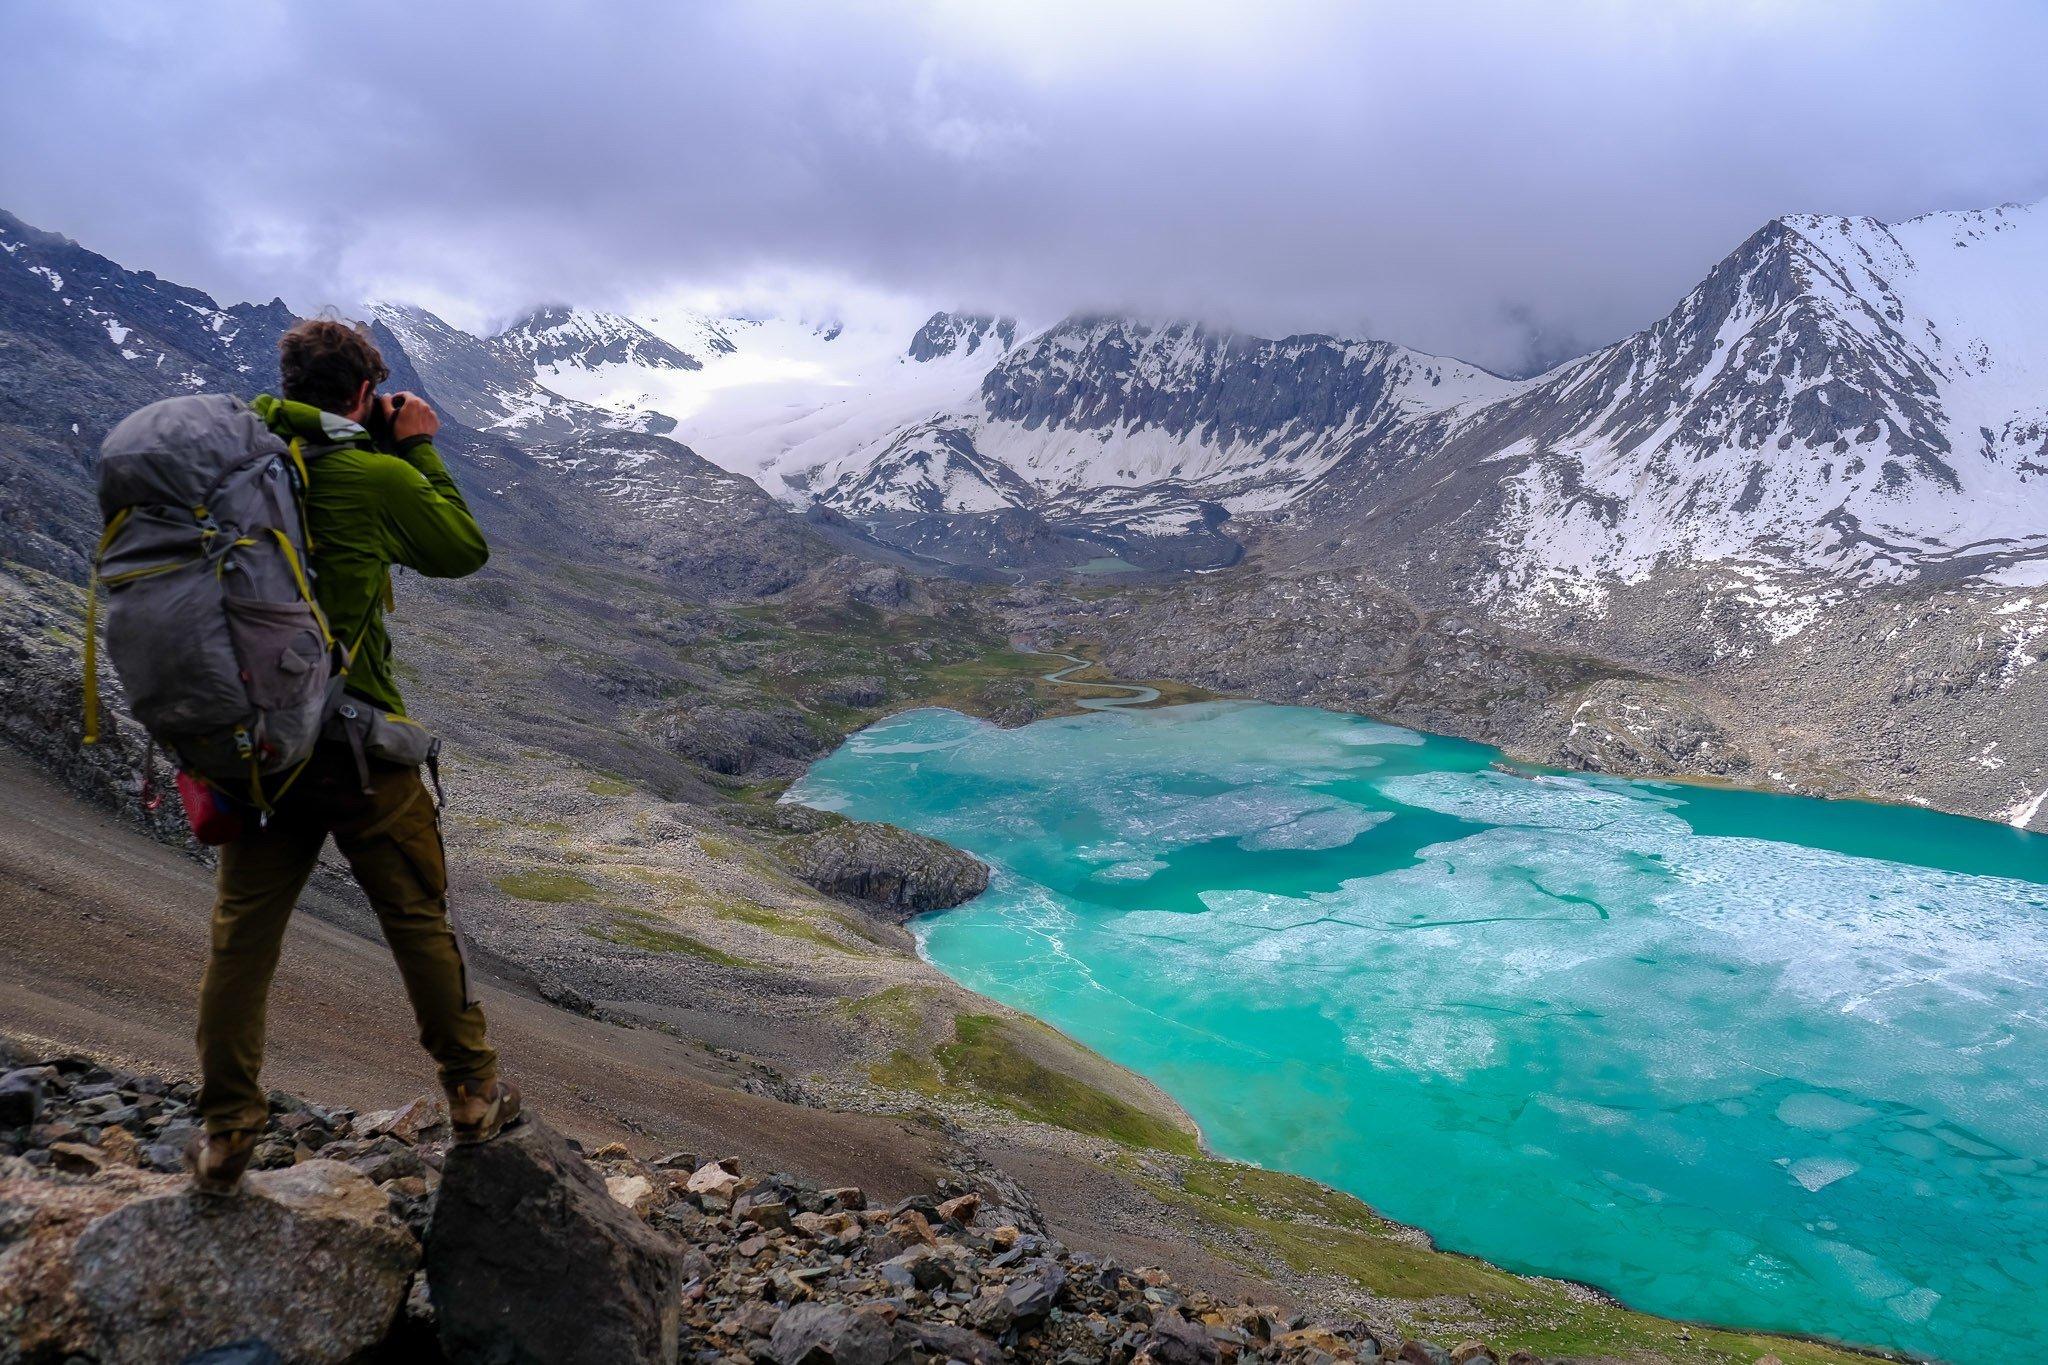 Best Canon Lenses For Landscape